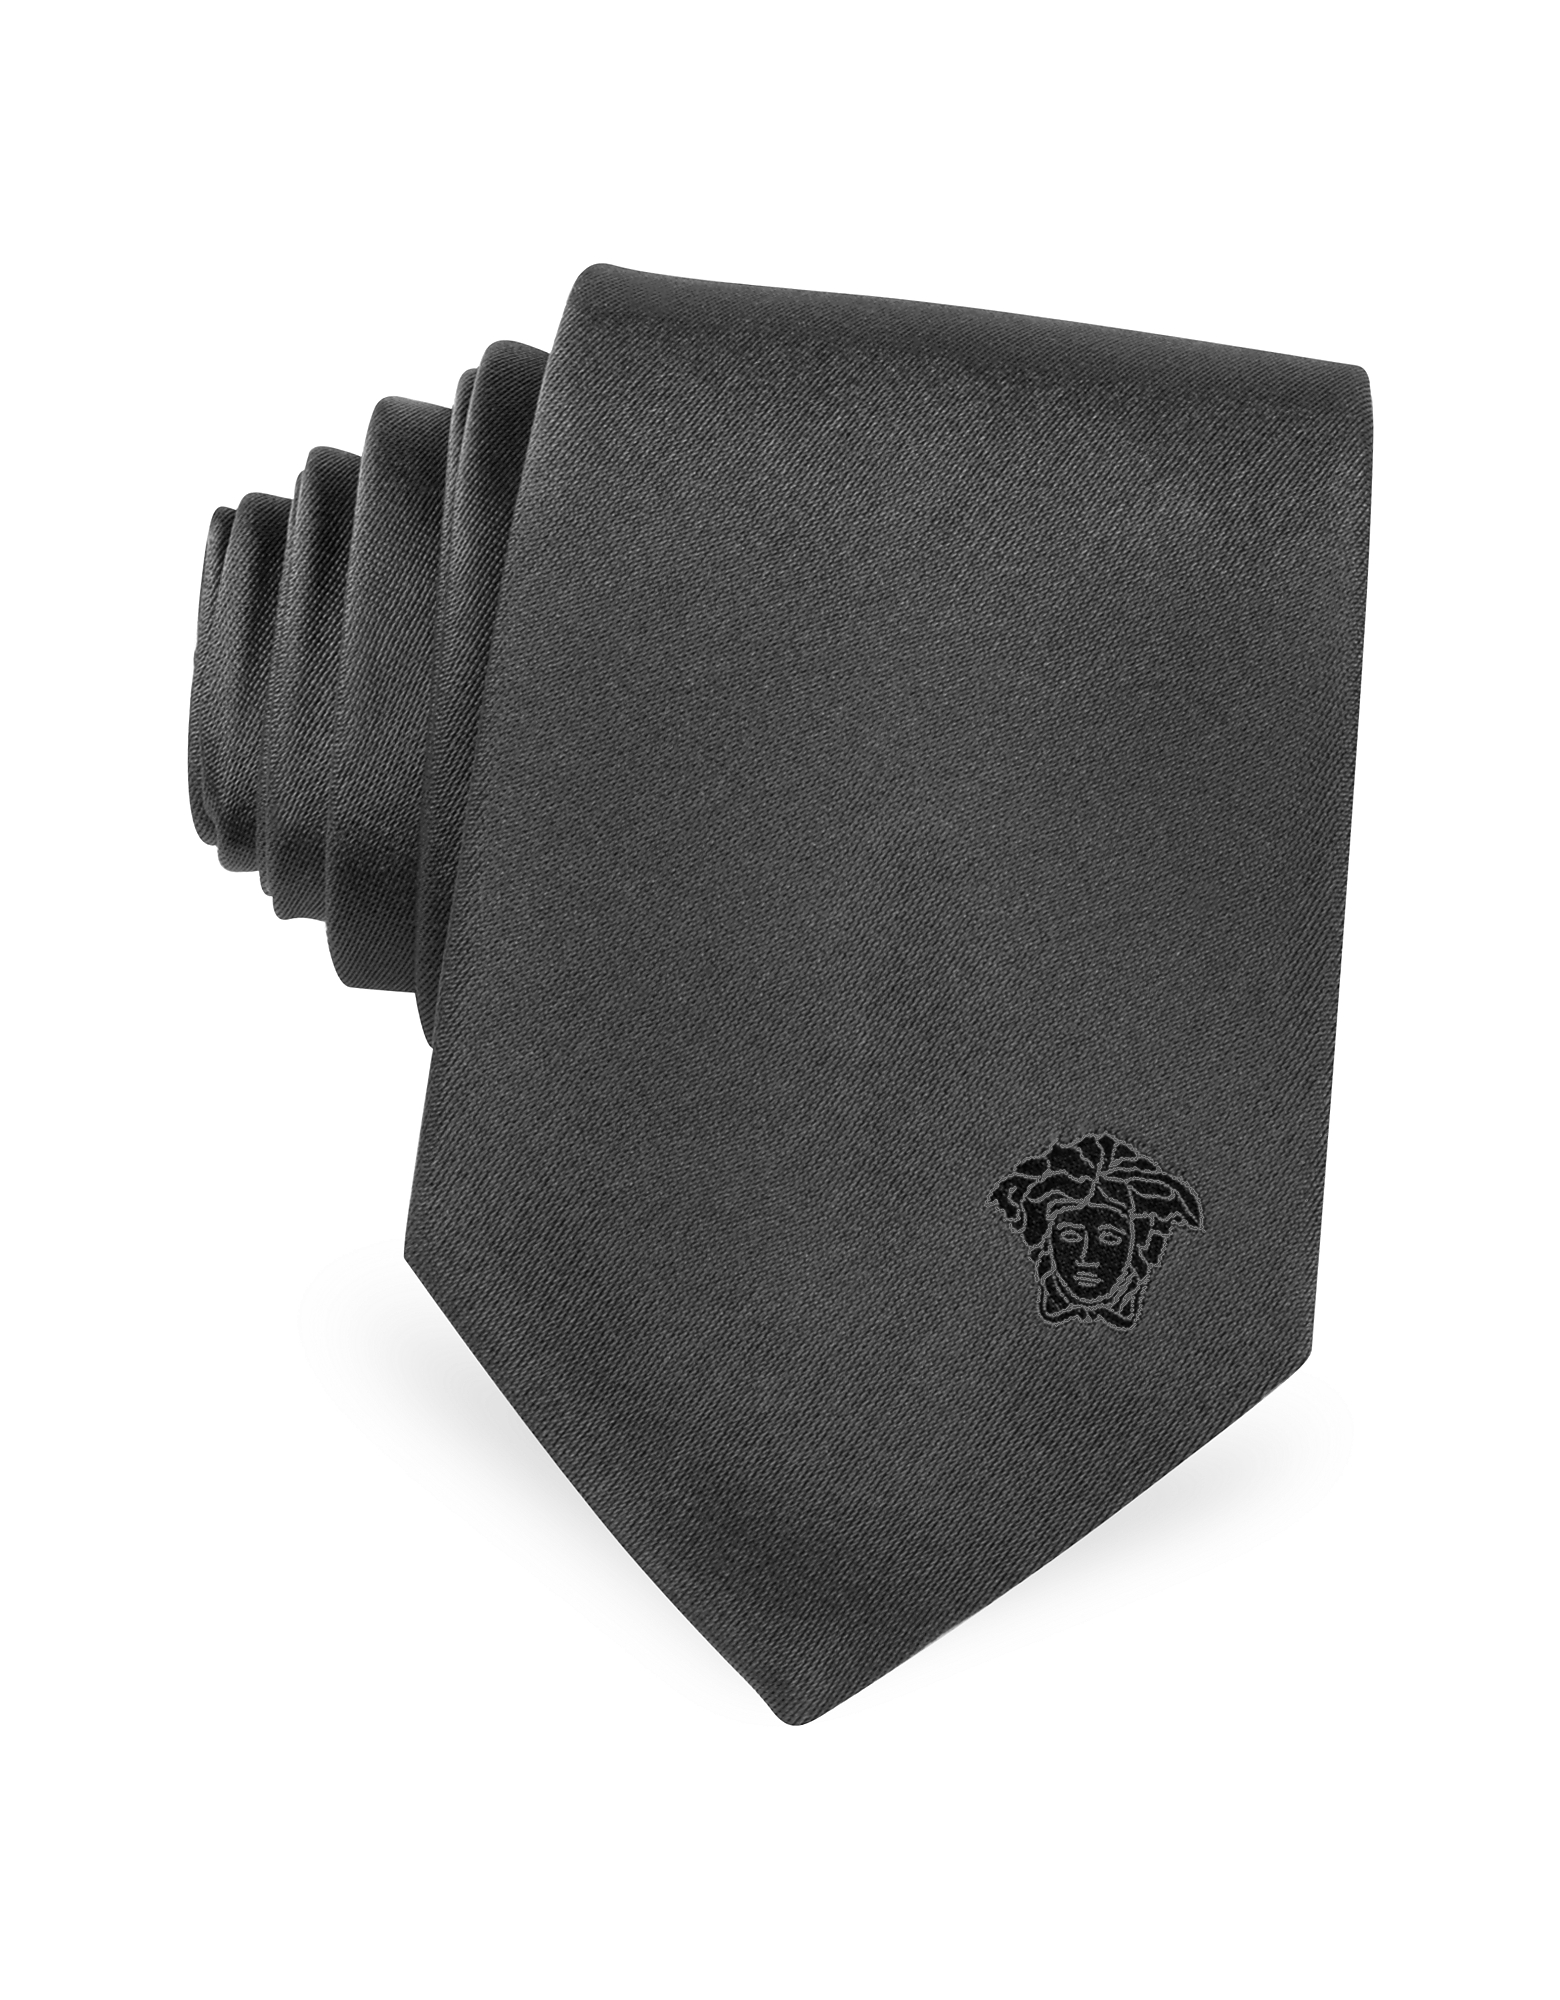 Versace Designer Narrow Ties, Solid Silk Medusa Narrow Tie